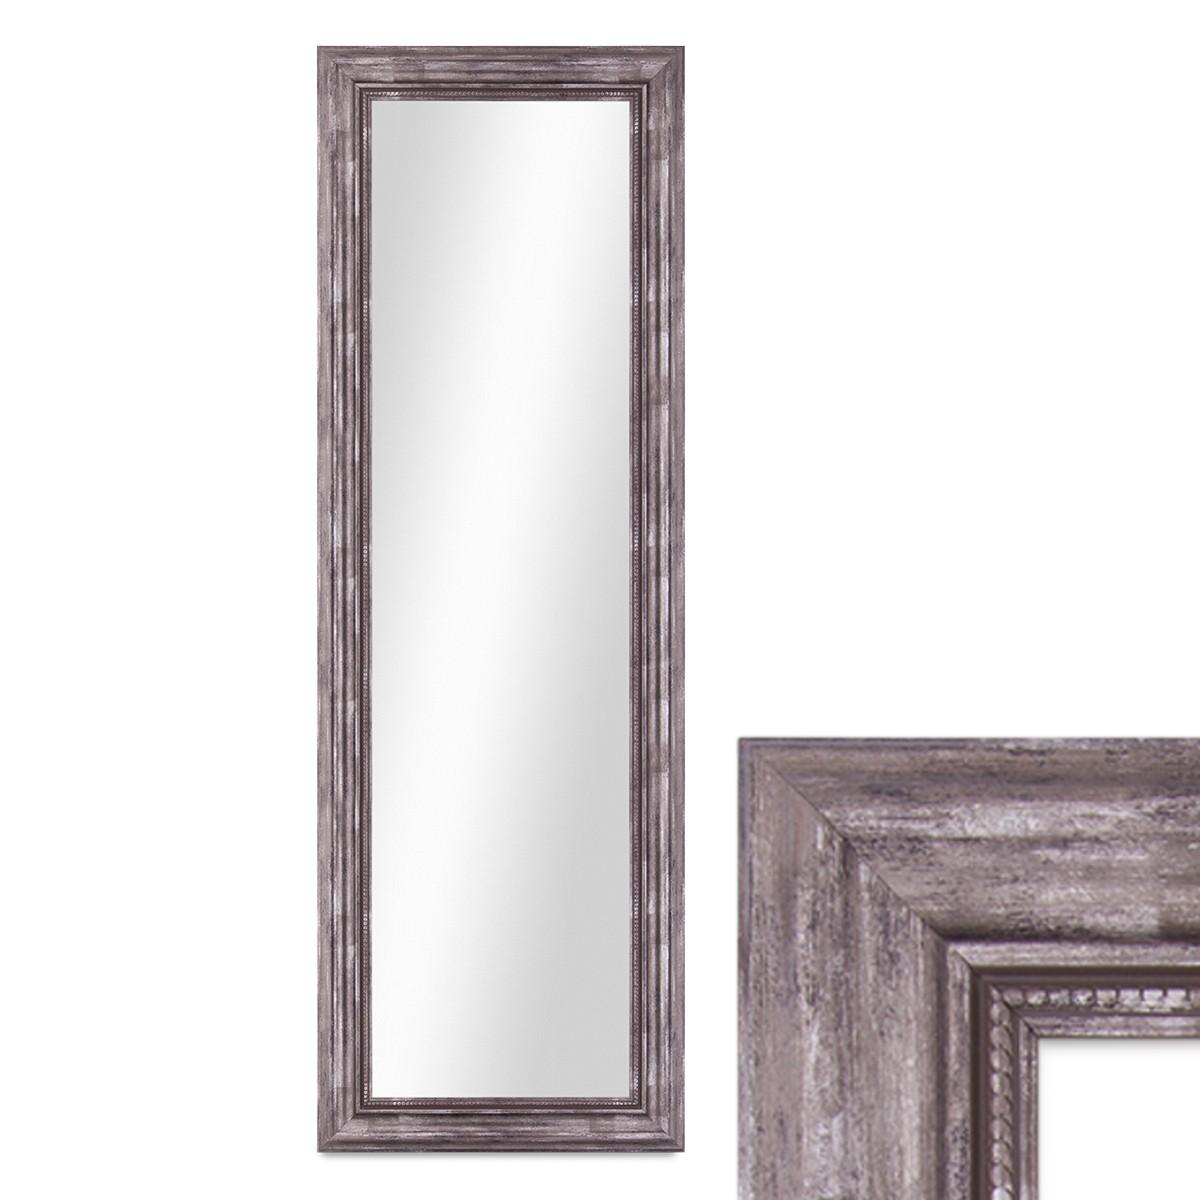 wand spiegel 40x100 cm im massivholz rahmen barock stil antik silber spiegelfl che 30x90 cm. Black Bedroom Furniture Sets. Home Design Ideas